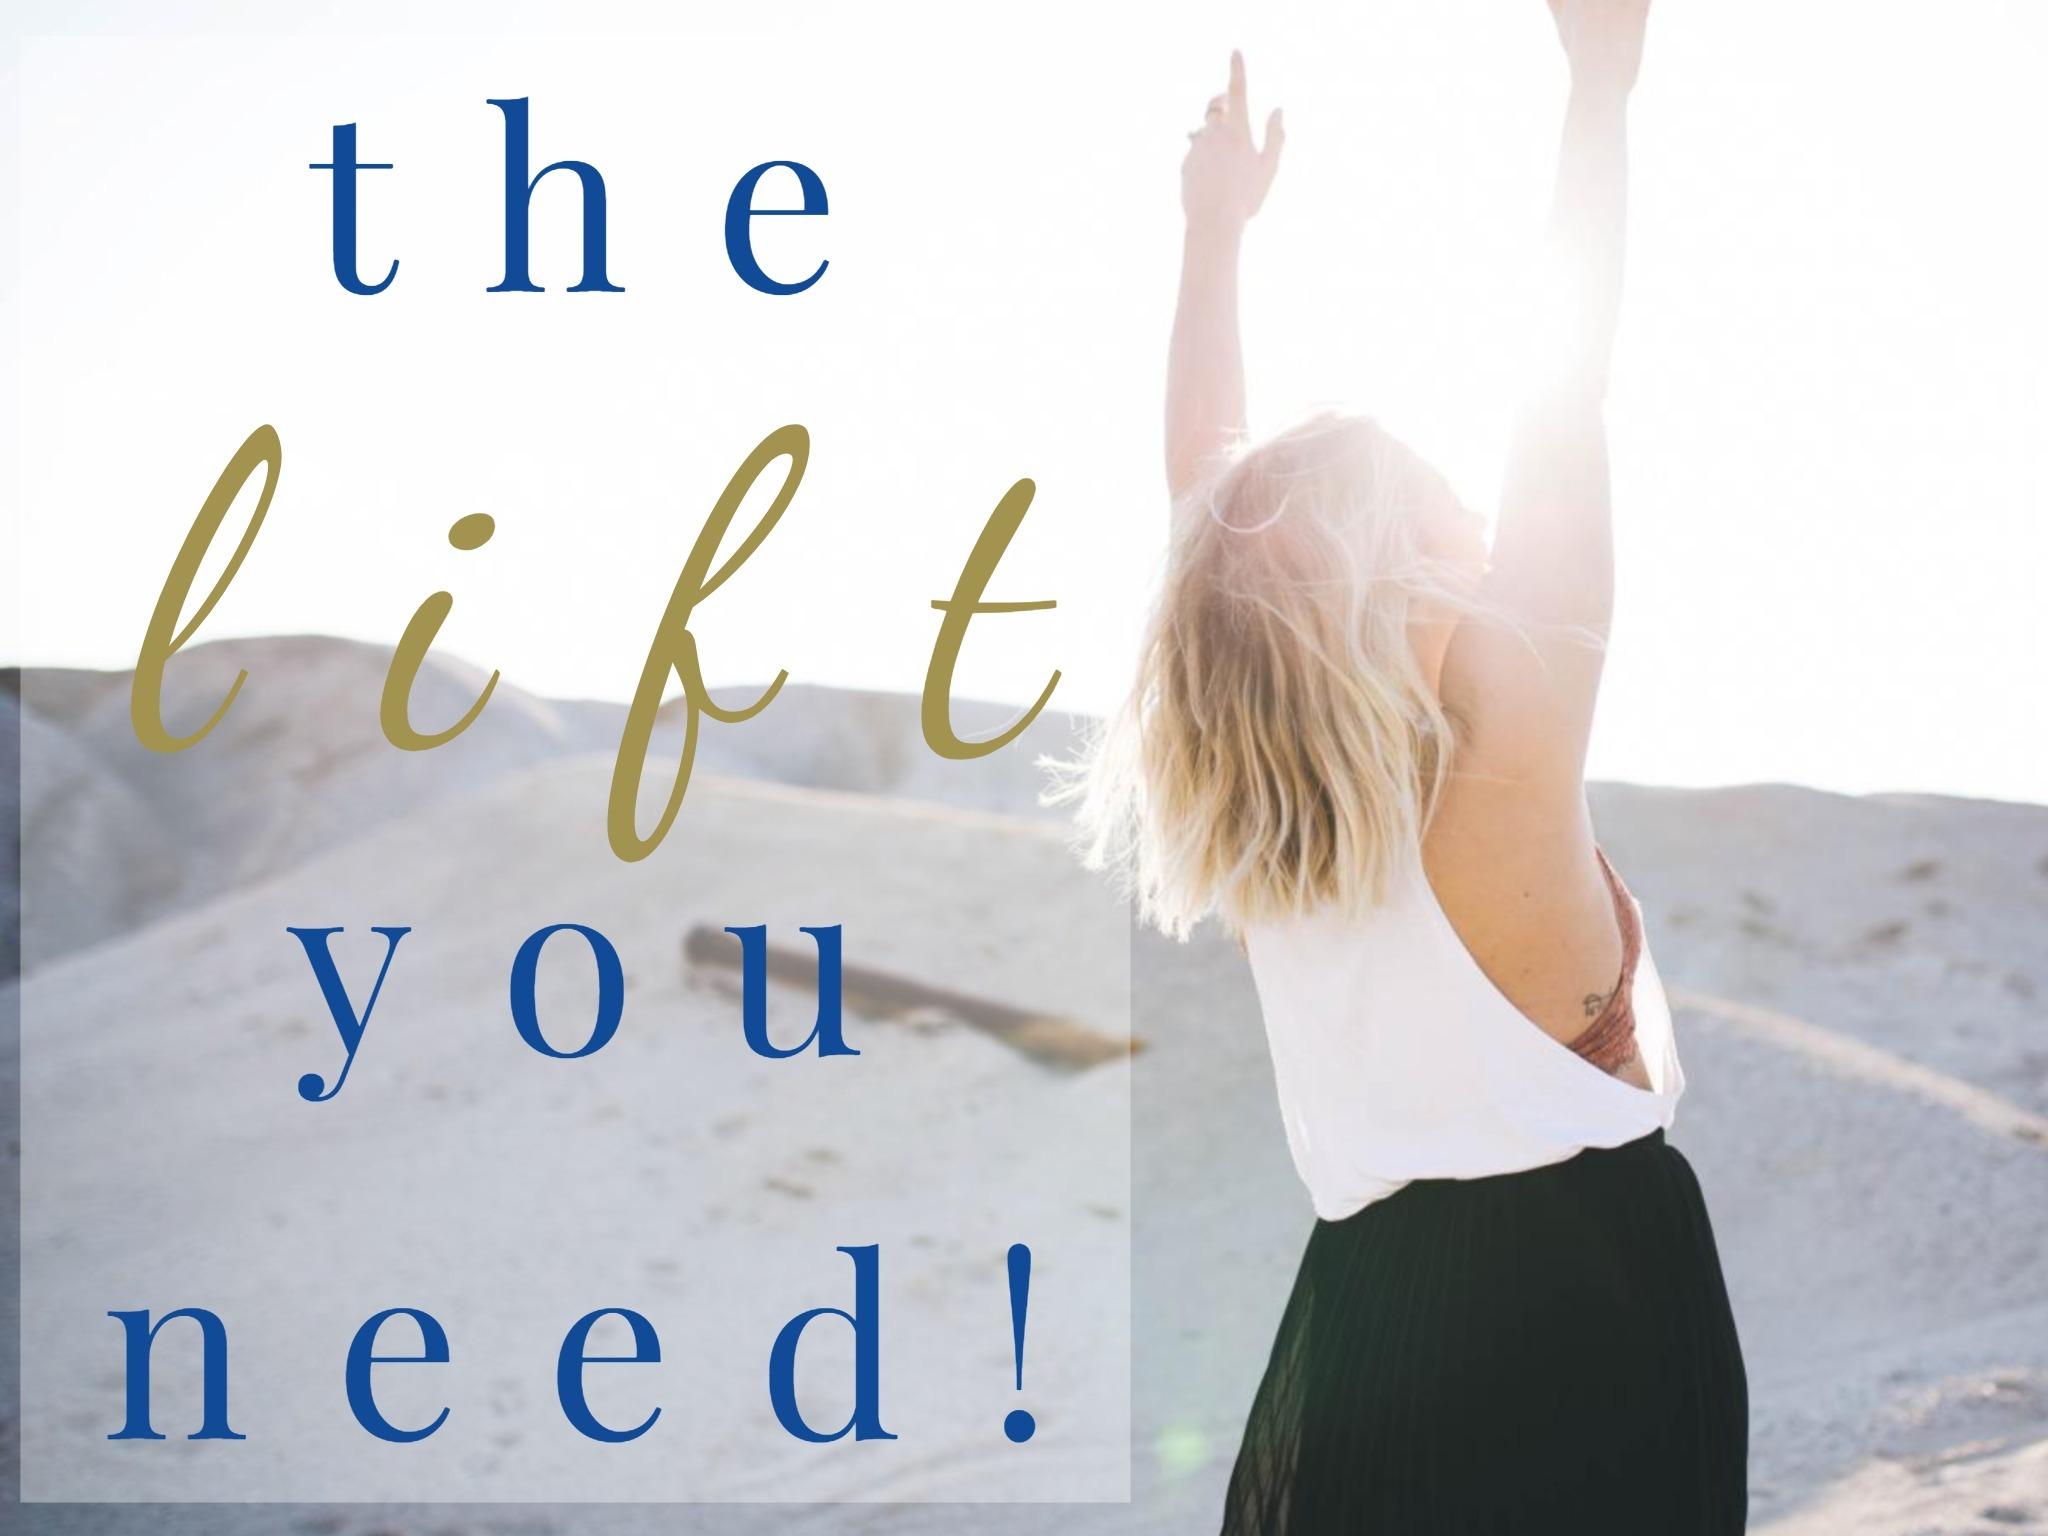 lift you need